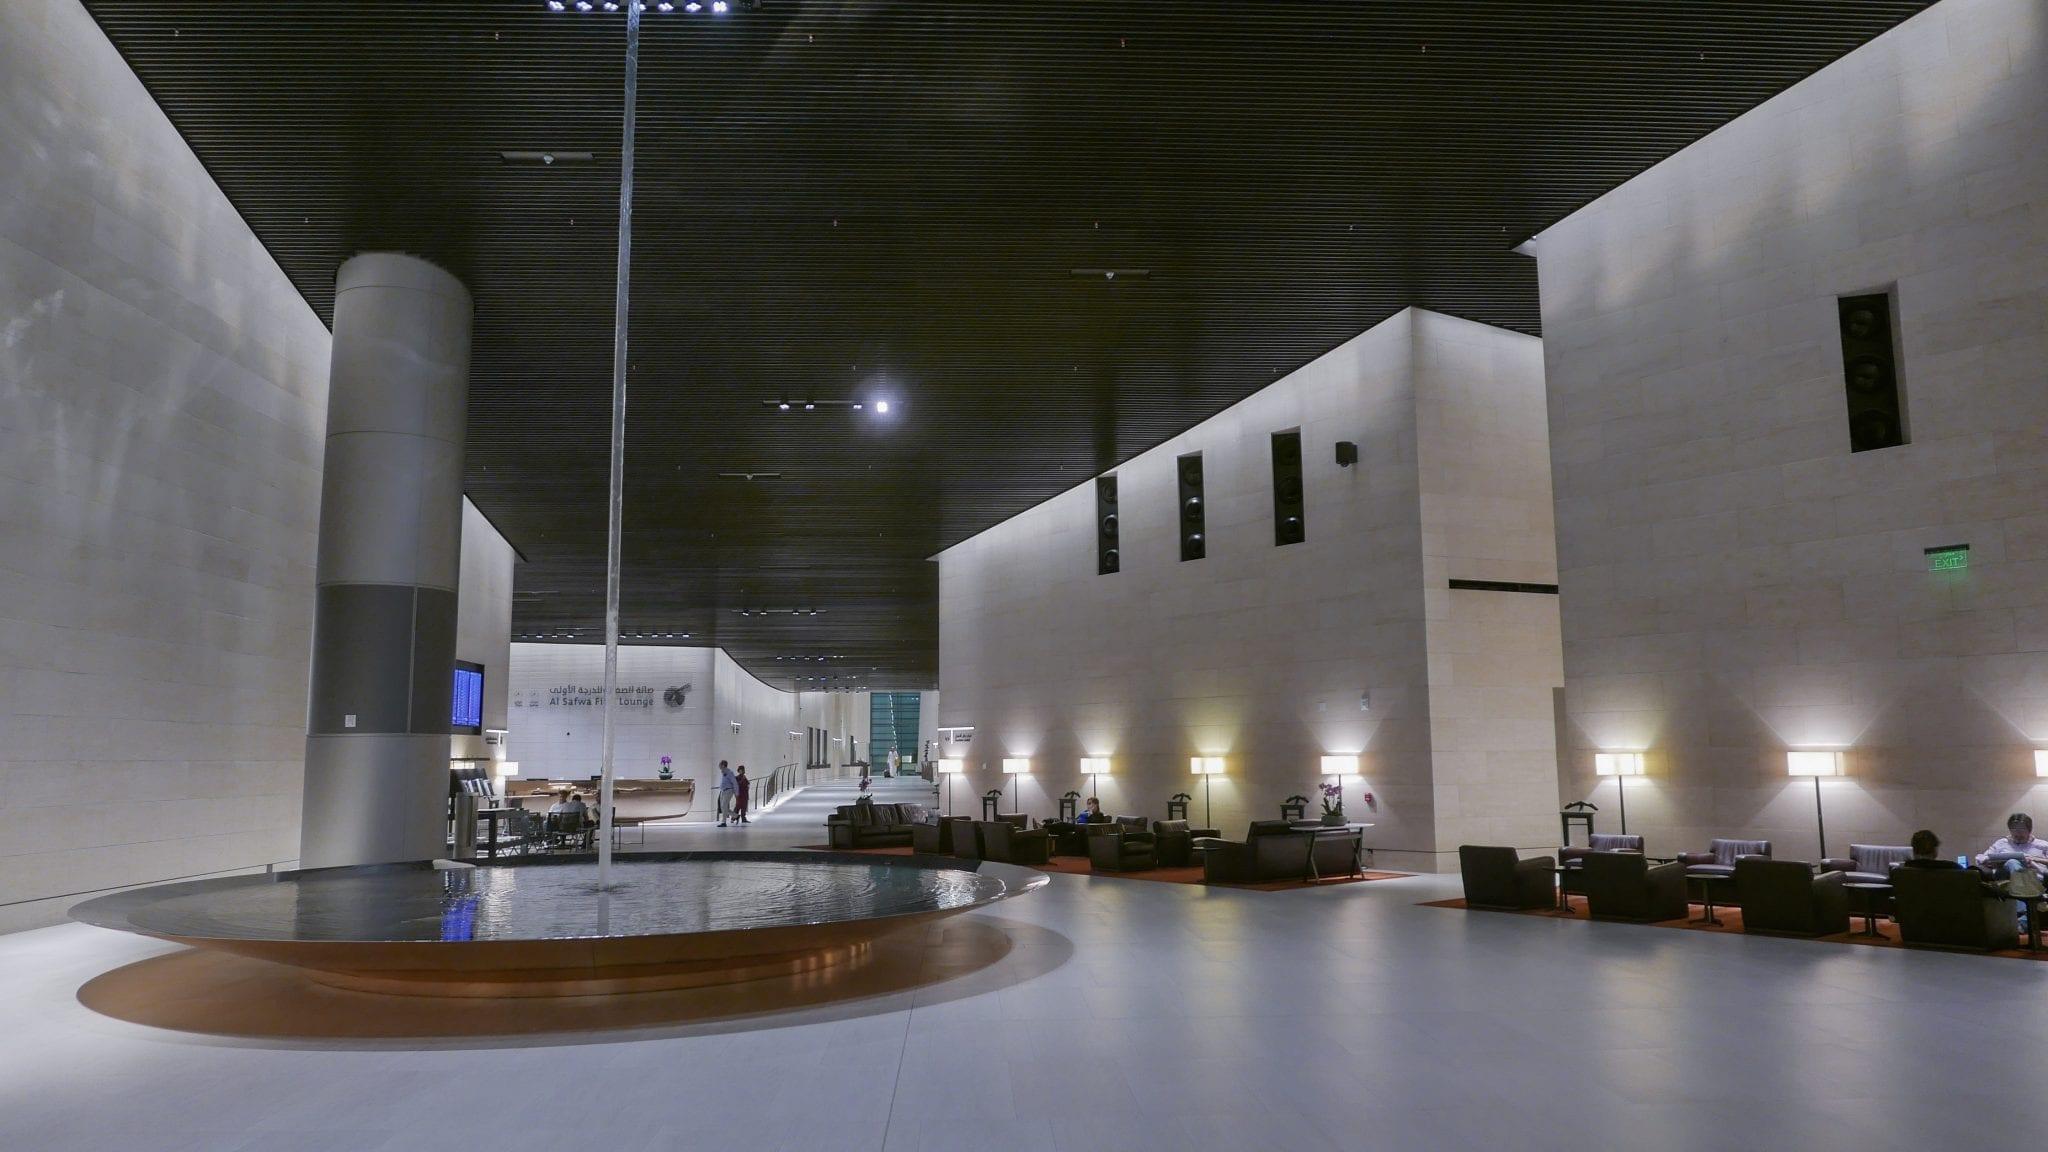 al safwa 2 - REVIEW - Qatar Al Safwa First Class Lounge - Doha